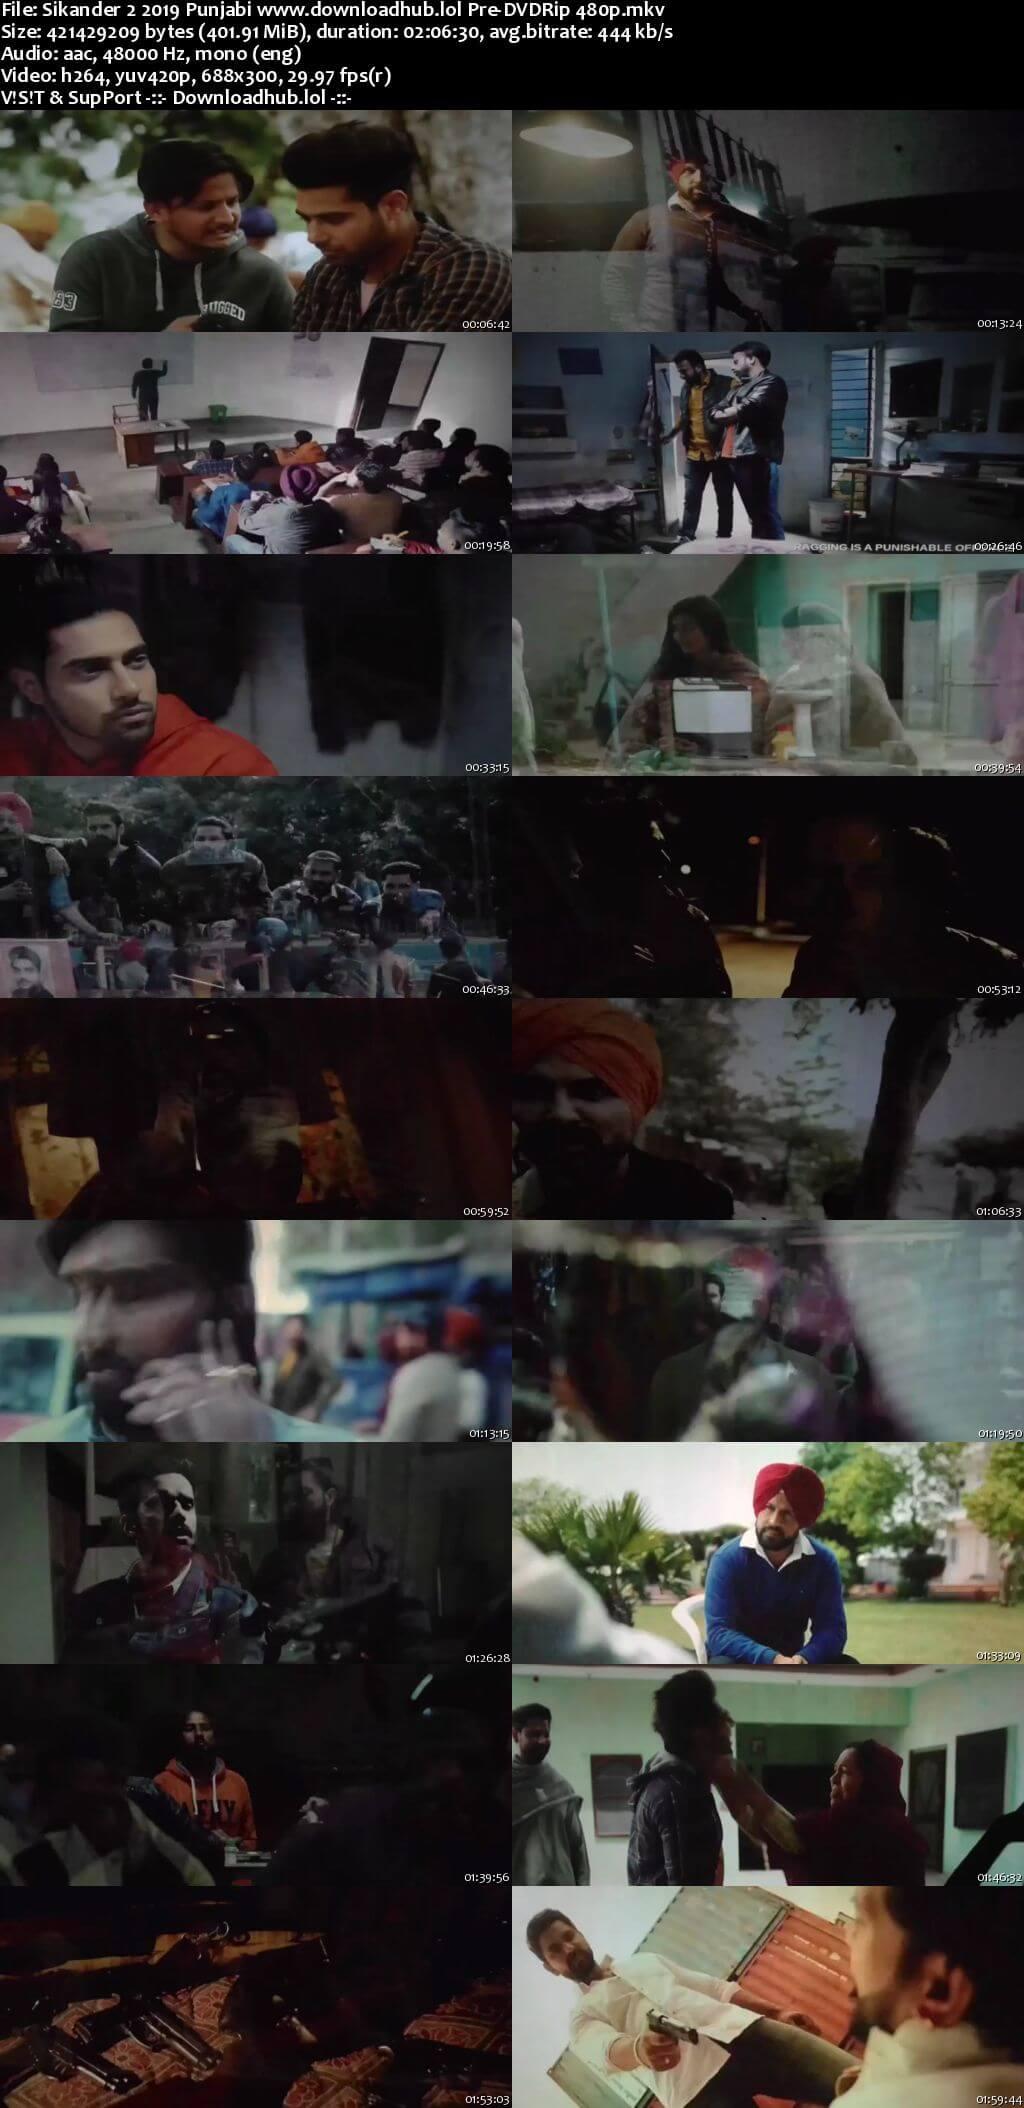 Sikander 2 2019 Punjabi 400MB Pre-DVDRip 480p